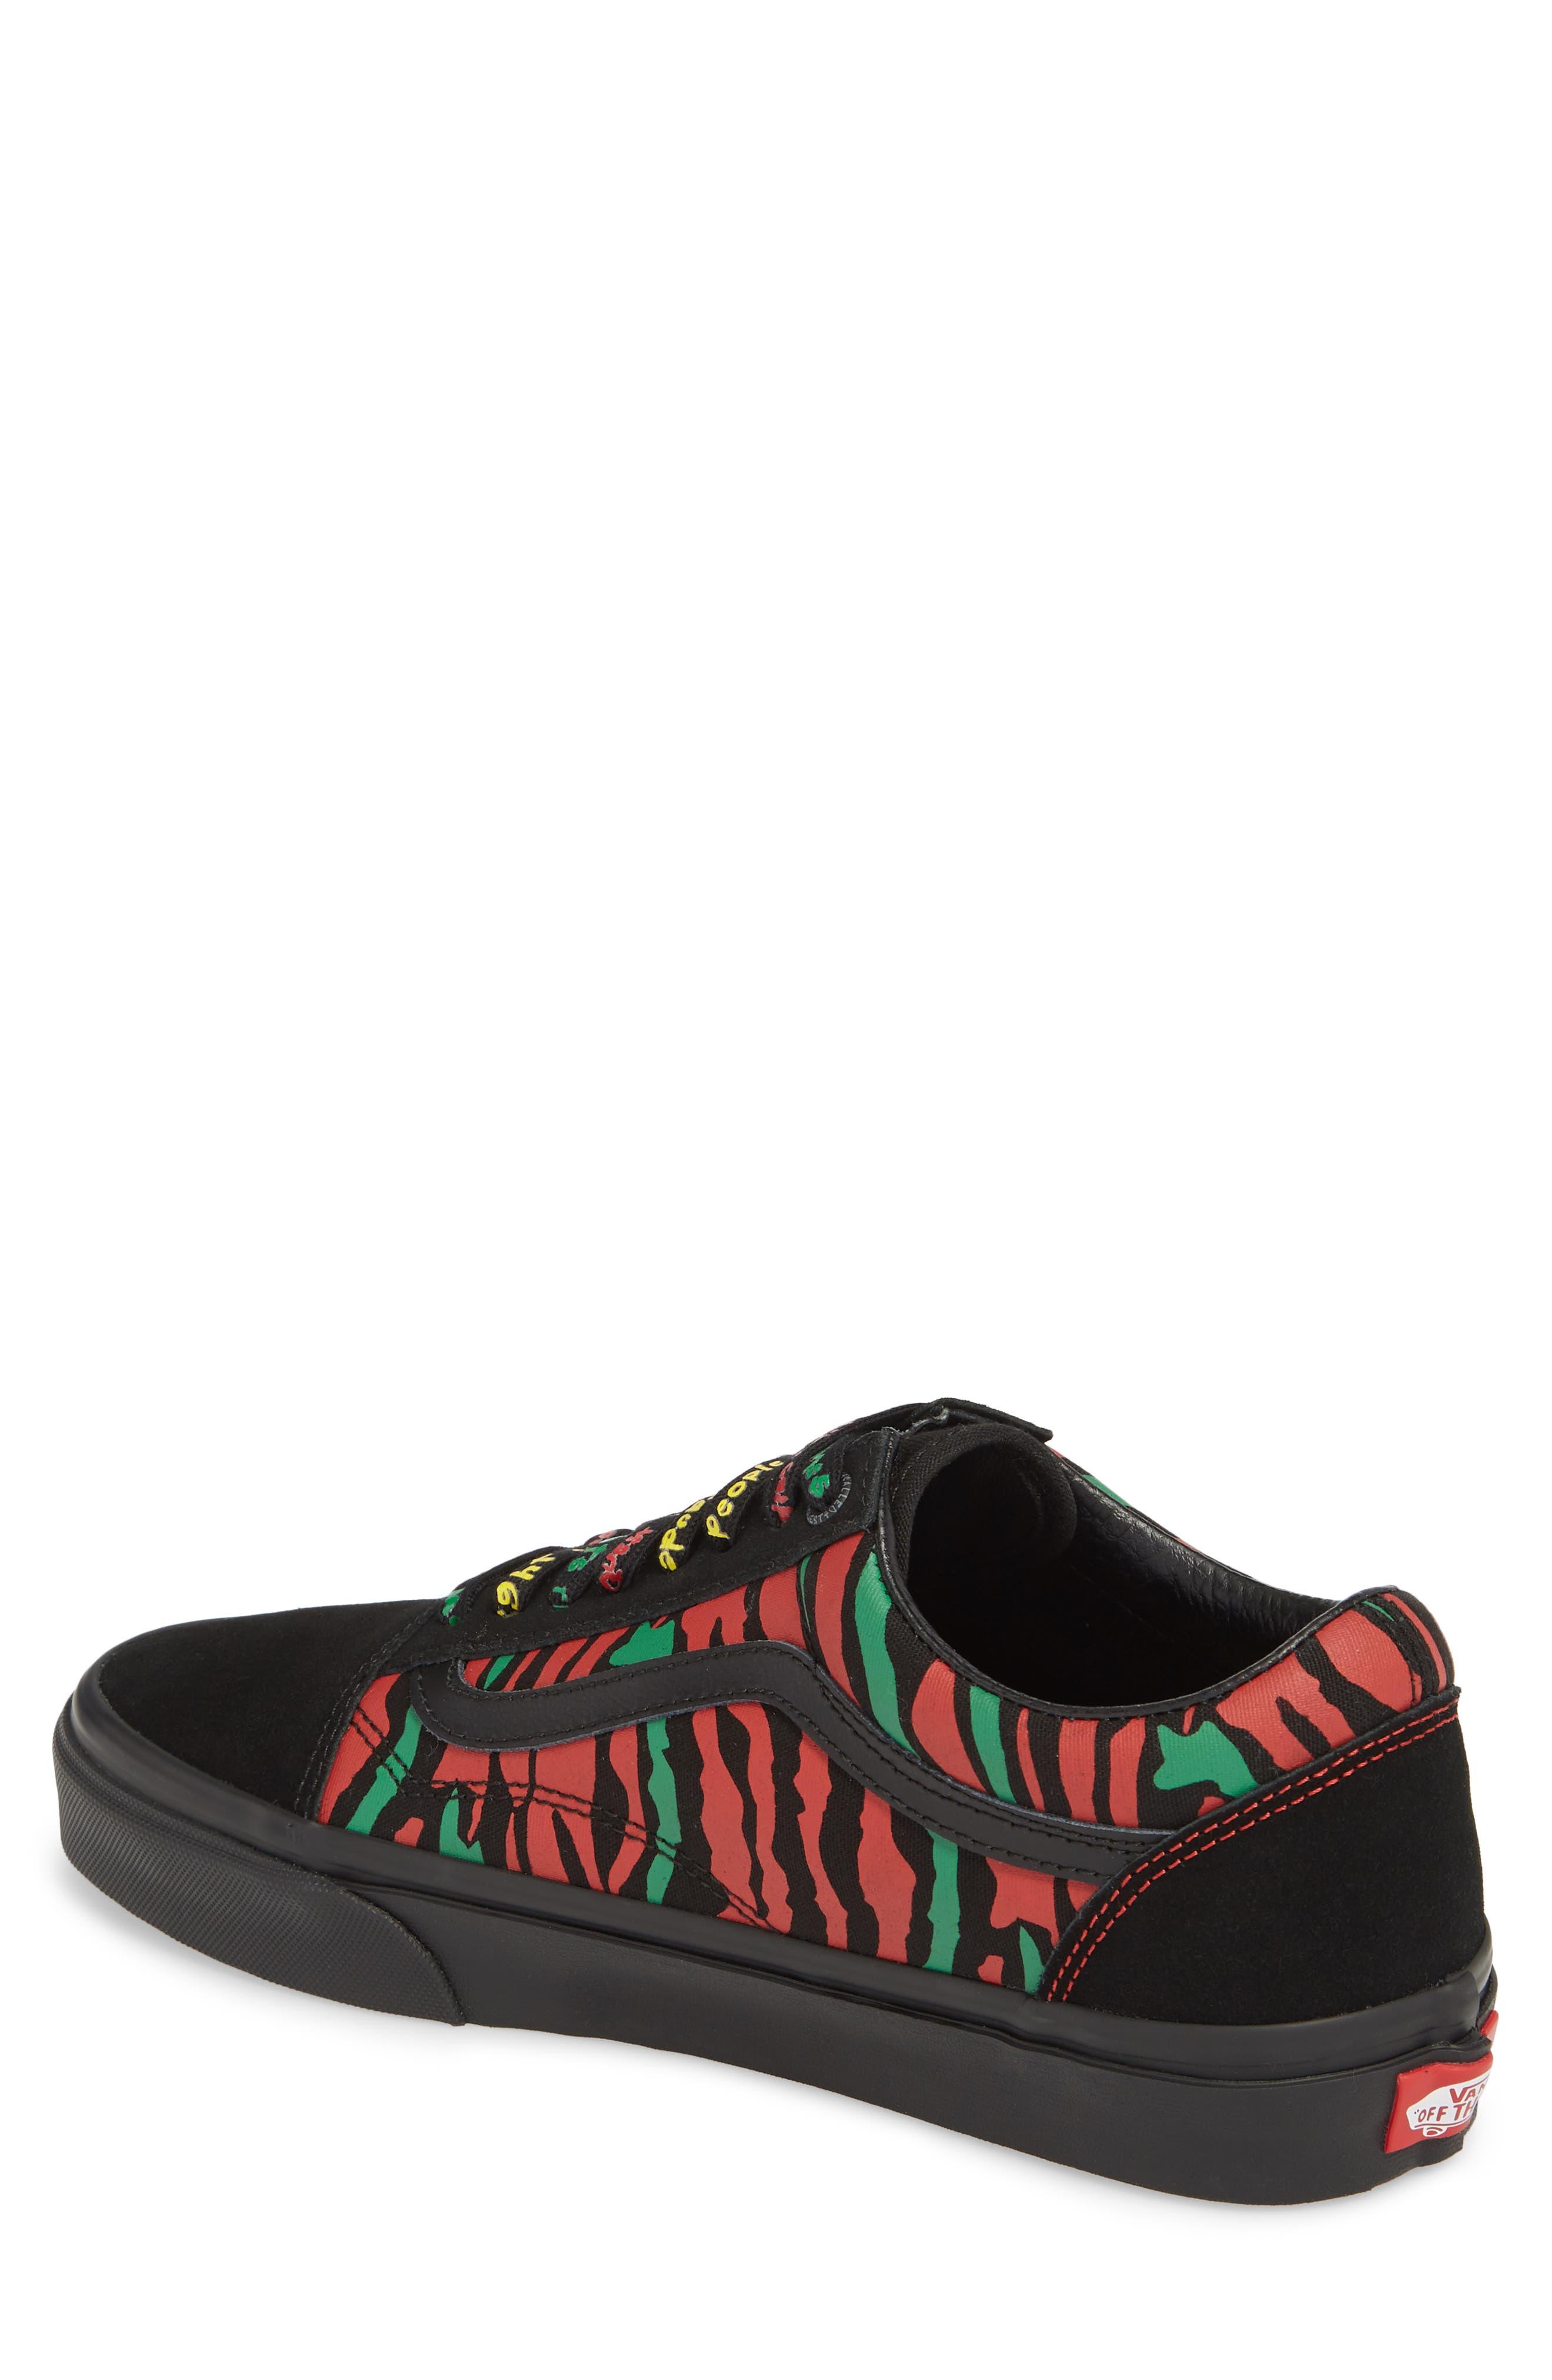 ATCQ Old Skool Sneaker,                             Alternate thumbnail 2, color,